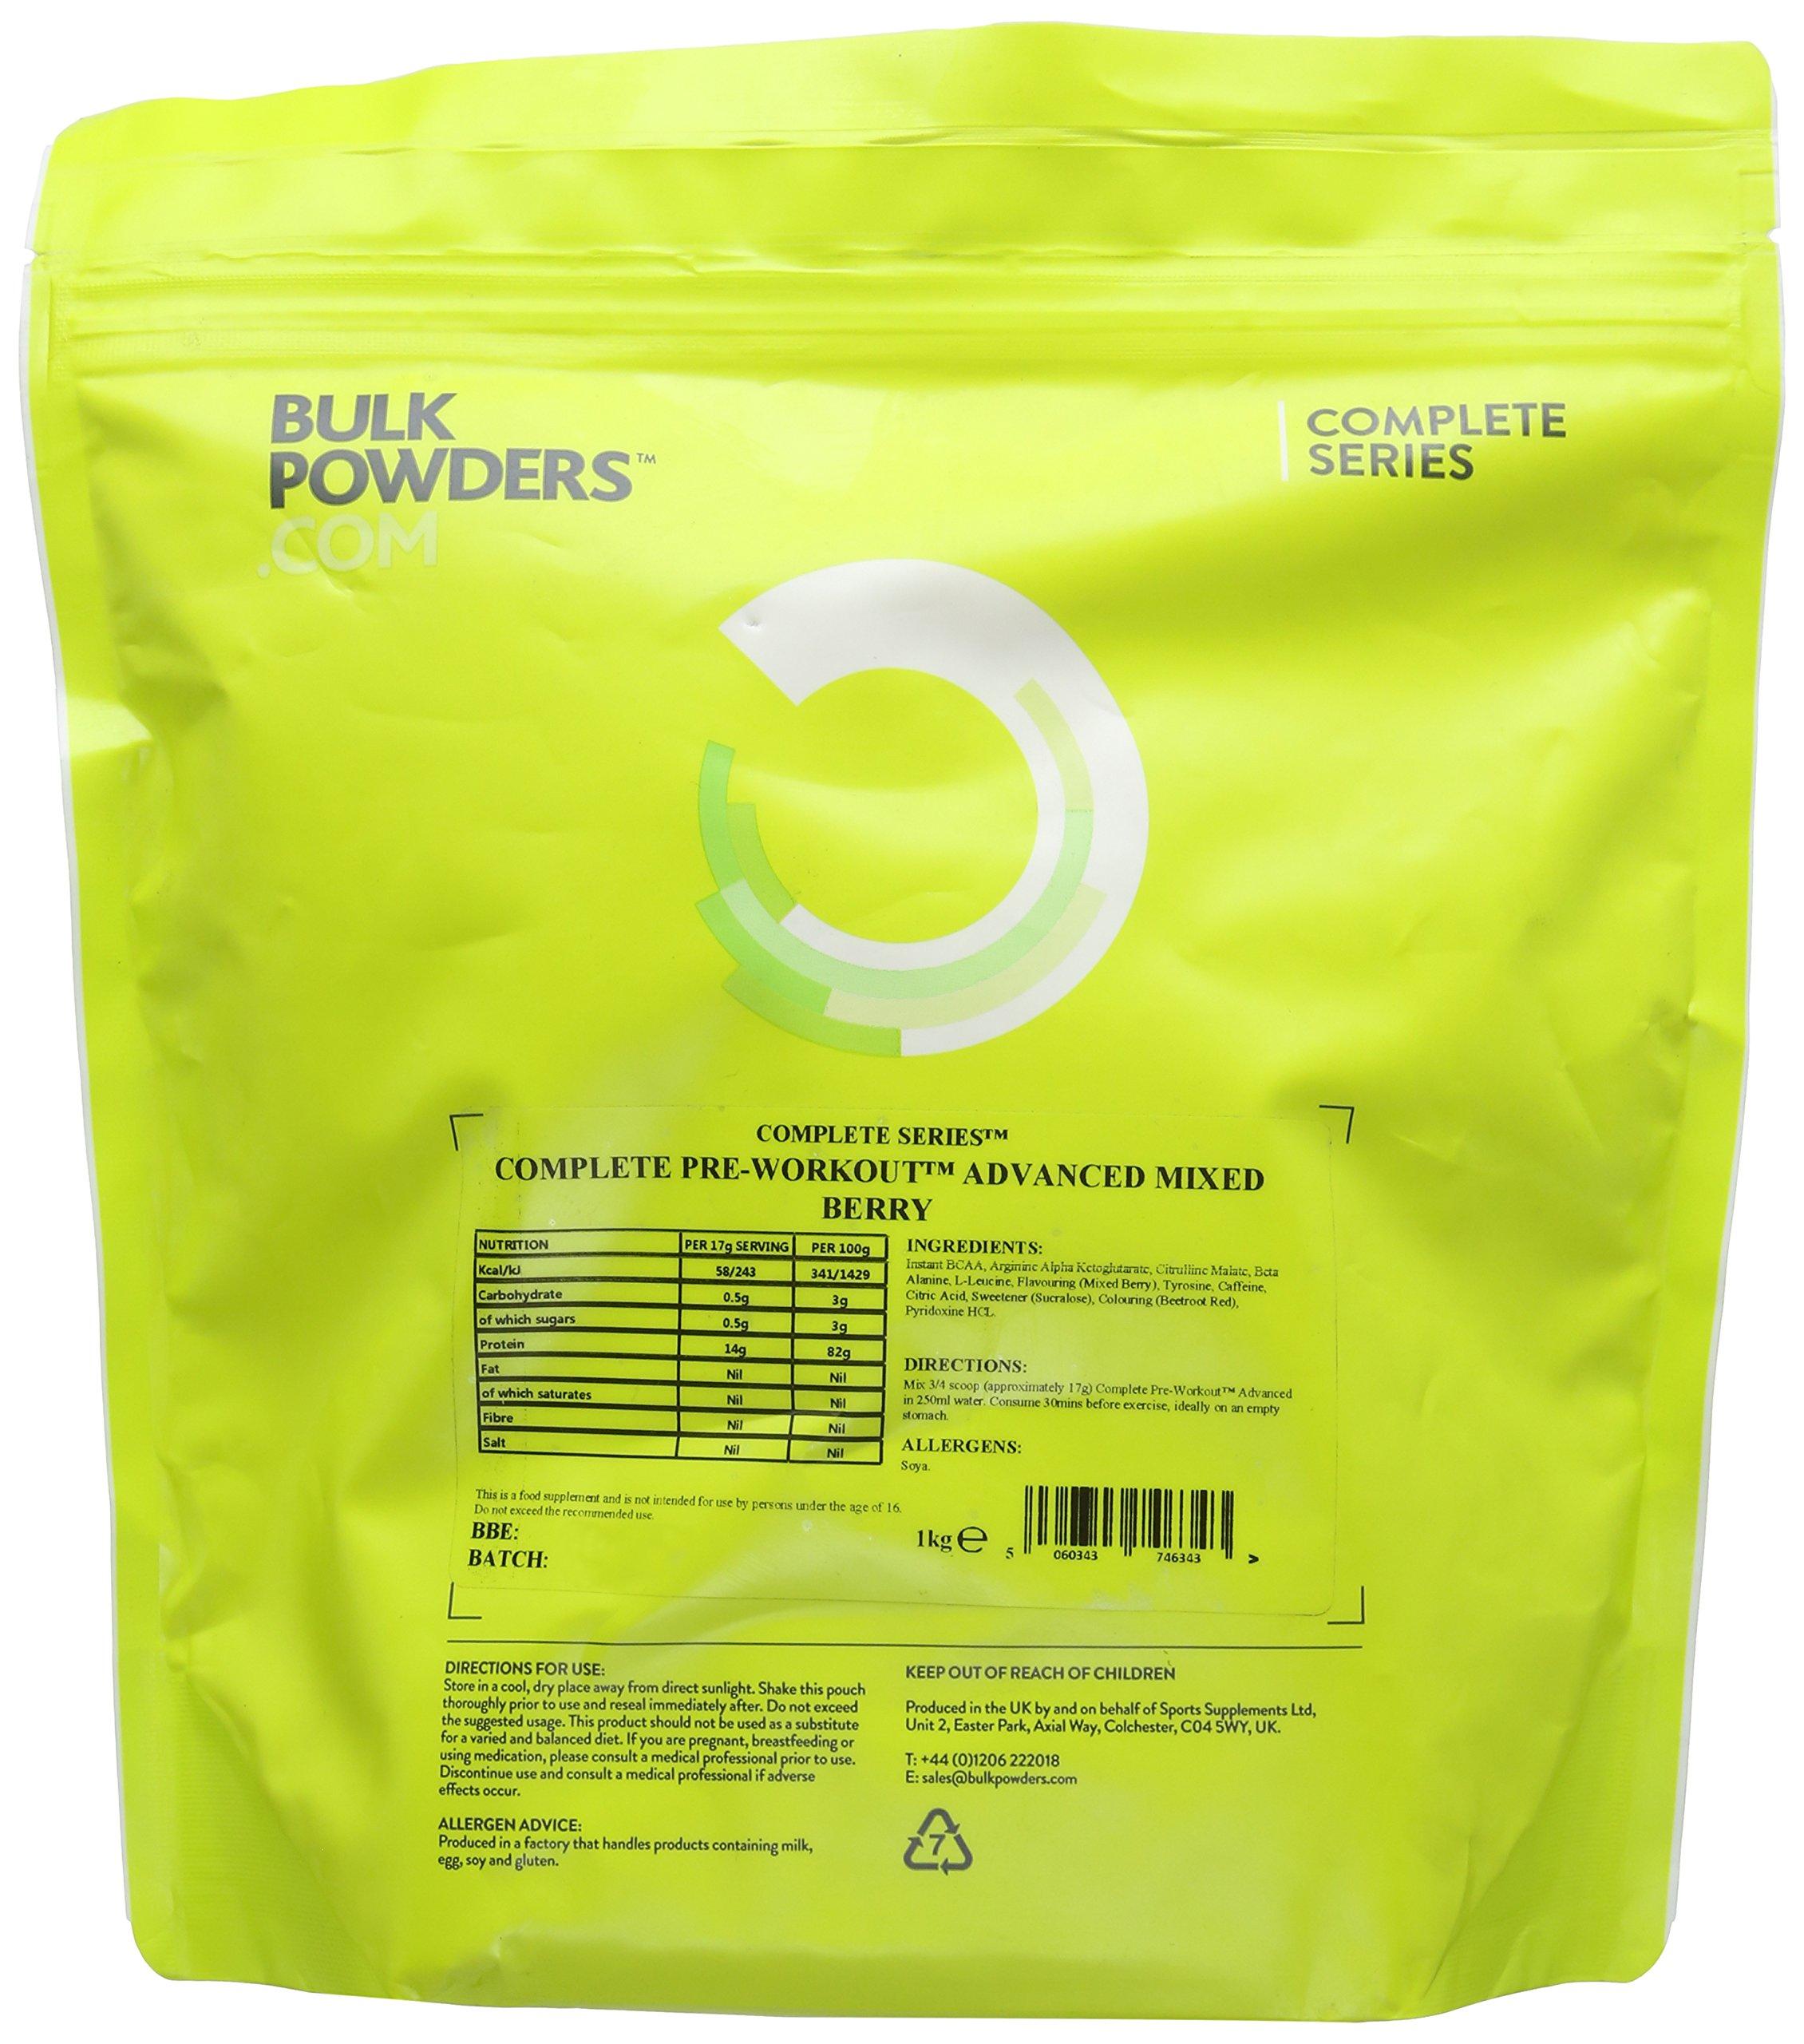 81Db469D8tL - BULK POWDERS Complete Pre Workout Advanced, Mixed Berry, 1 kg